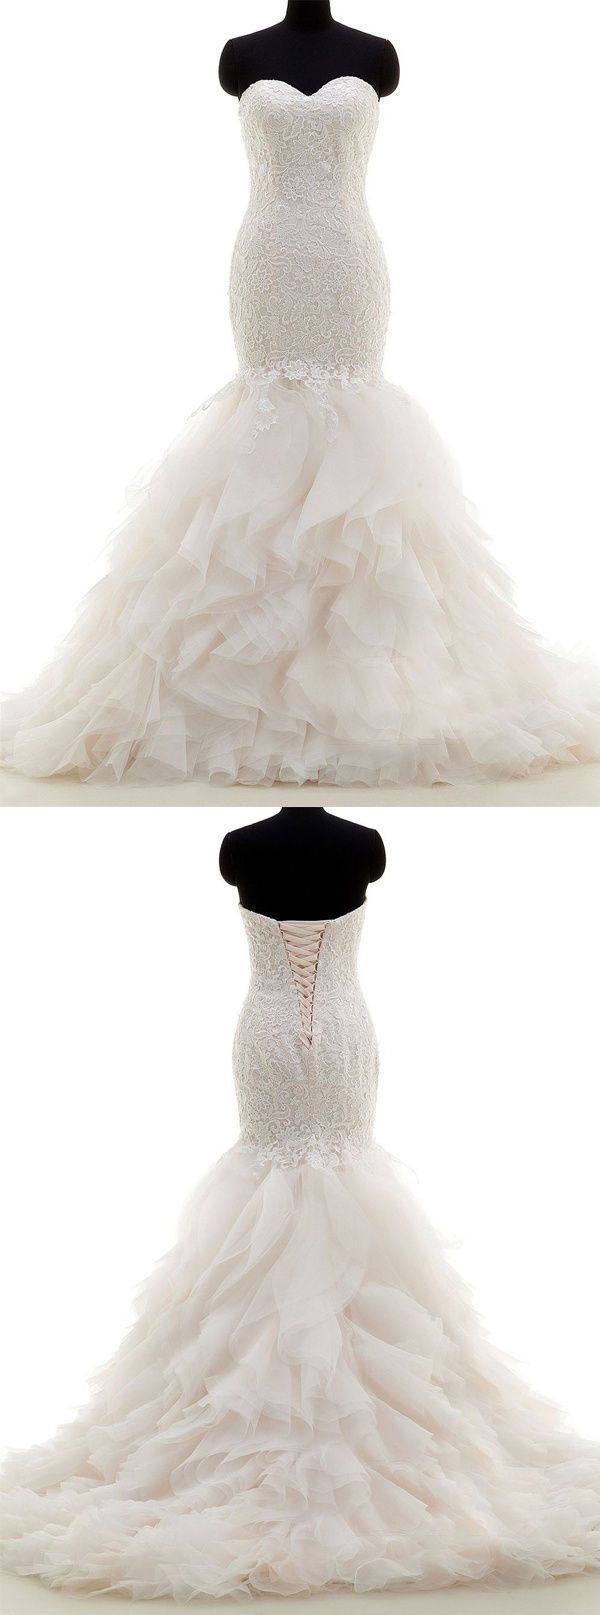 https://www.dresstells.com/glamorous-mermaid-trumpet-wedding-dress-sweetheart-court-train-ivory-oraganza-appliques-ruffles-sleeveless-backless-zipper-up.html mermaid wedding dress, trumpet wedding dress, ivory wedding dress, 2016 wedding dress, #2016 #mermaid #ivory #trumpet